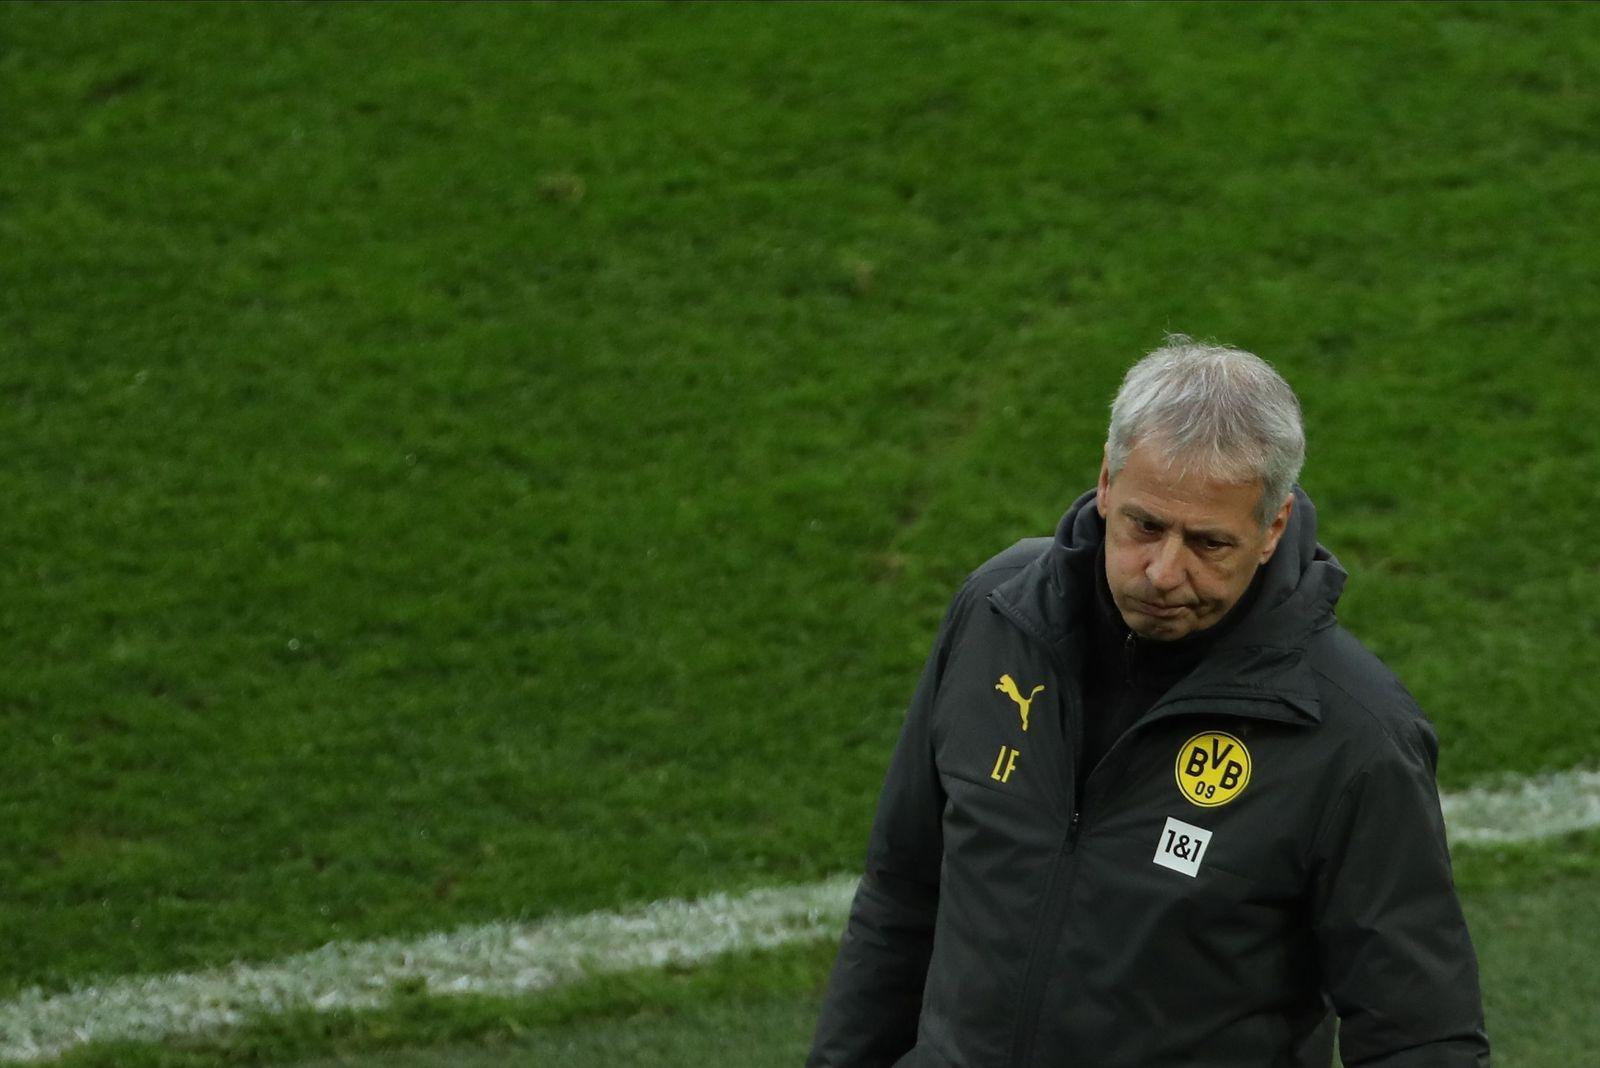 Borussia Dortmund vs VfB Stuttgart, Germany - 12 Dec 2020